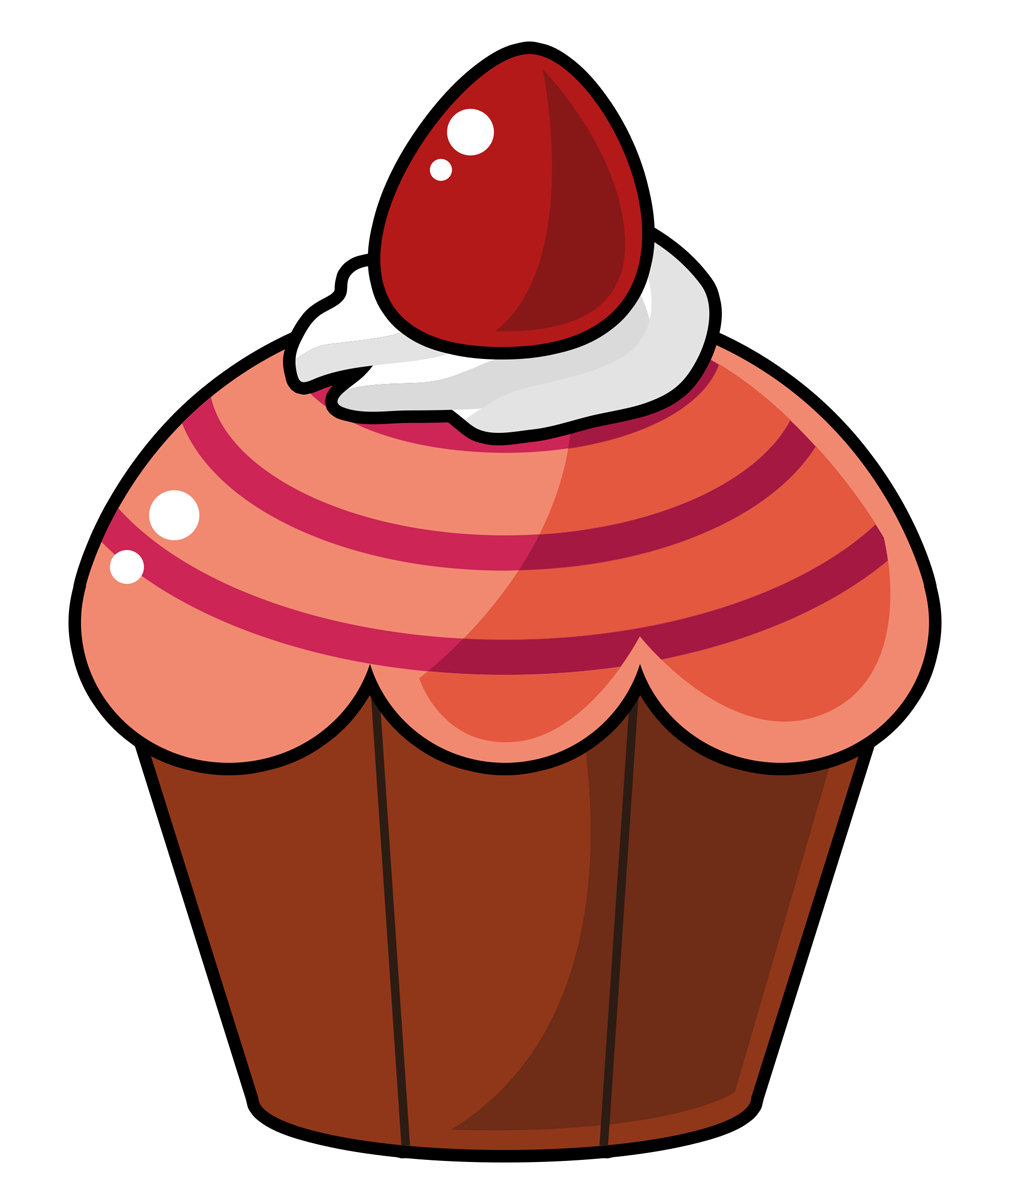 Free Cartoon Cupcake Clip Art U0026middo-Free Cartoon Cupcake Clip Art u0026middot; cupcake13-17